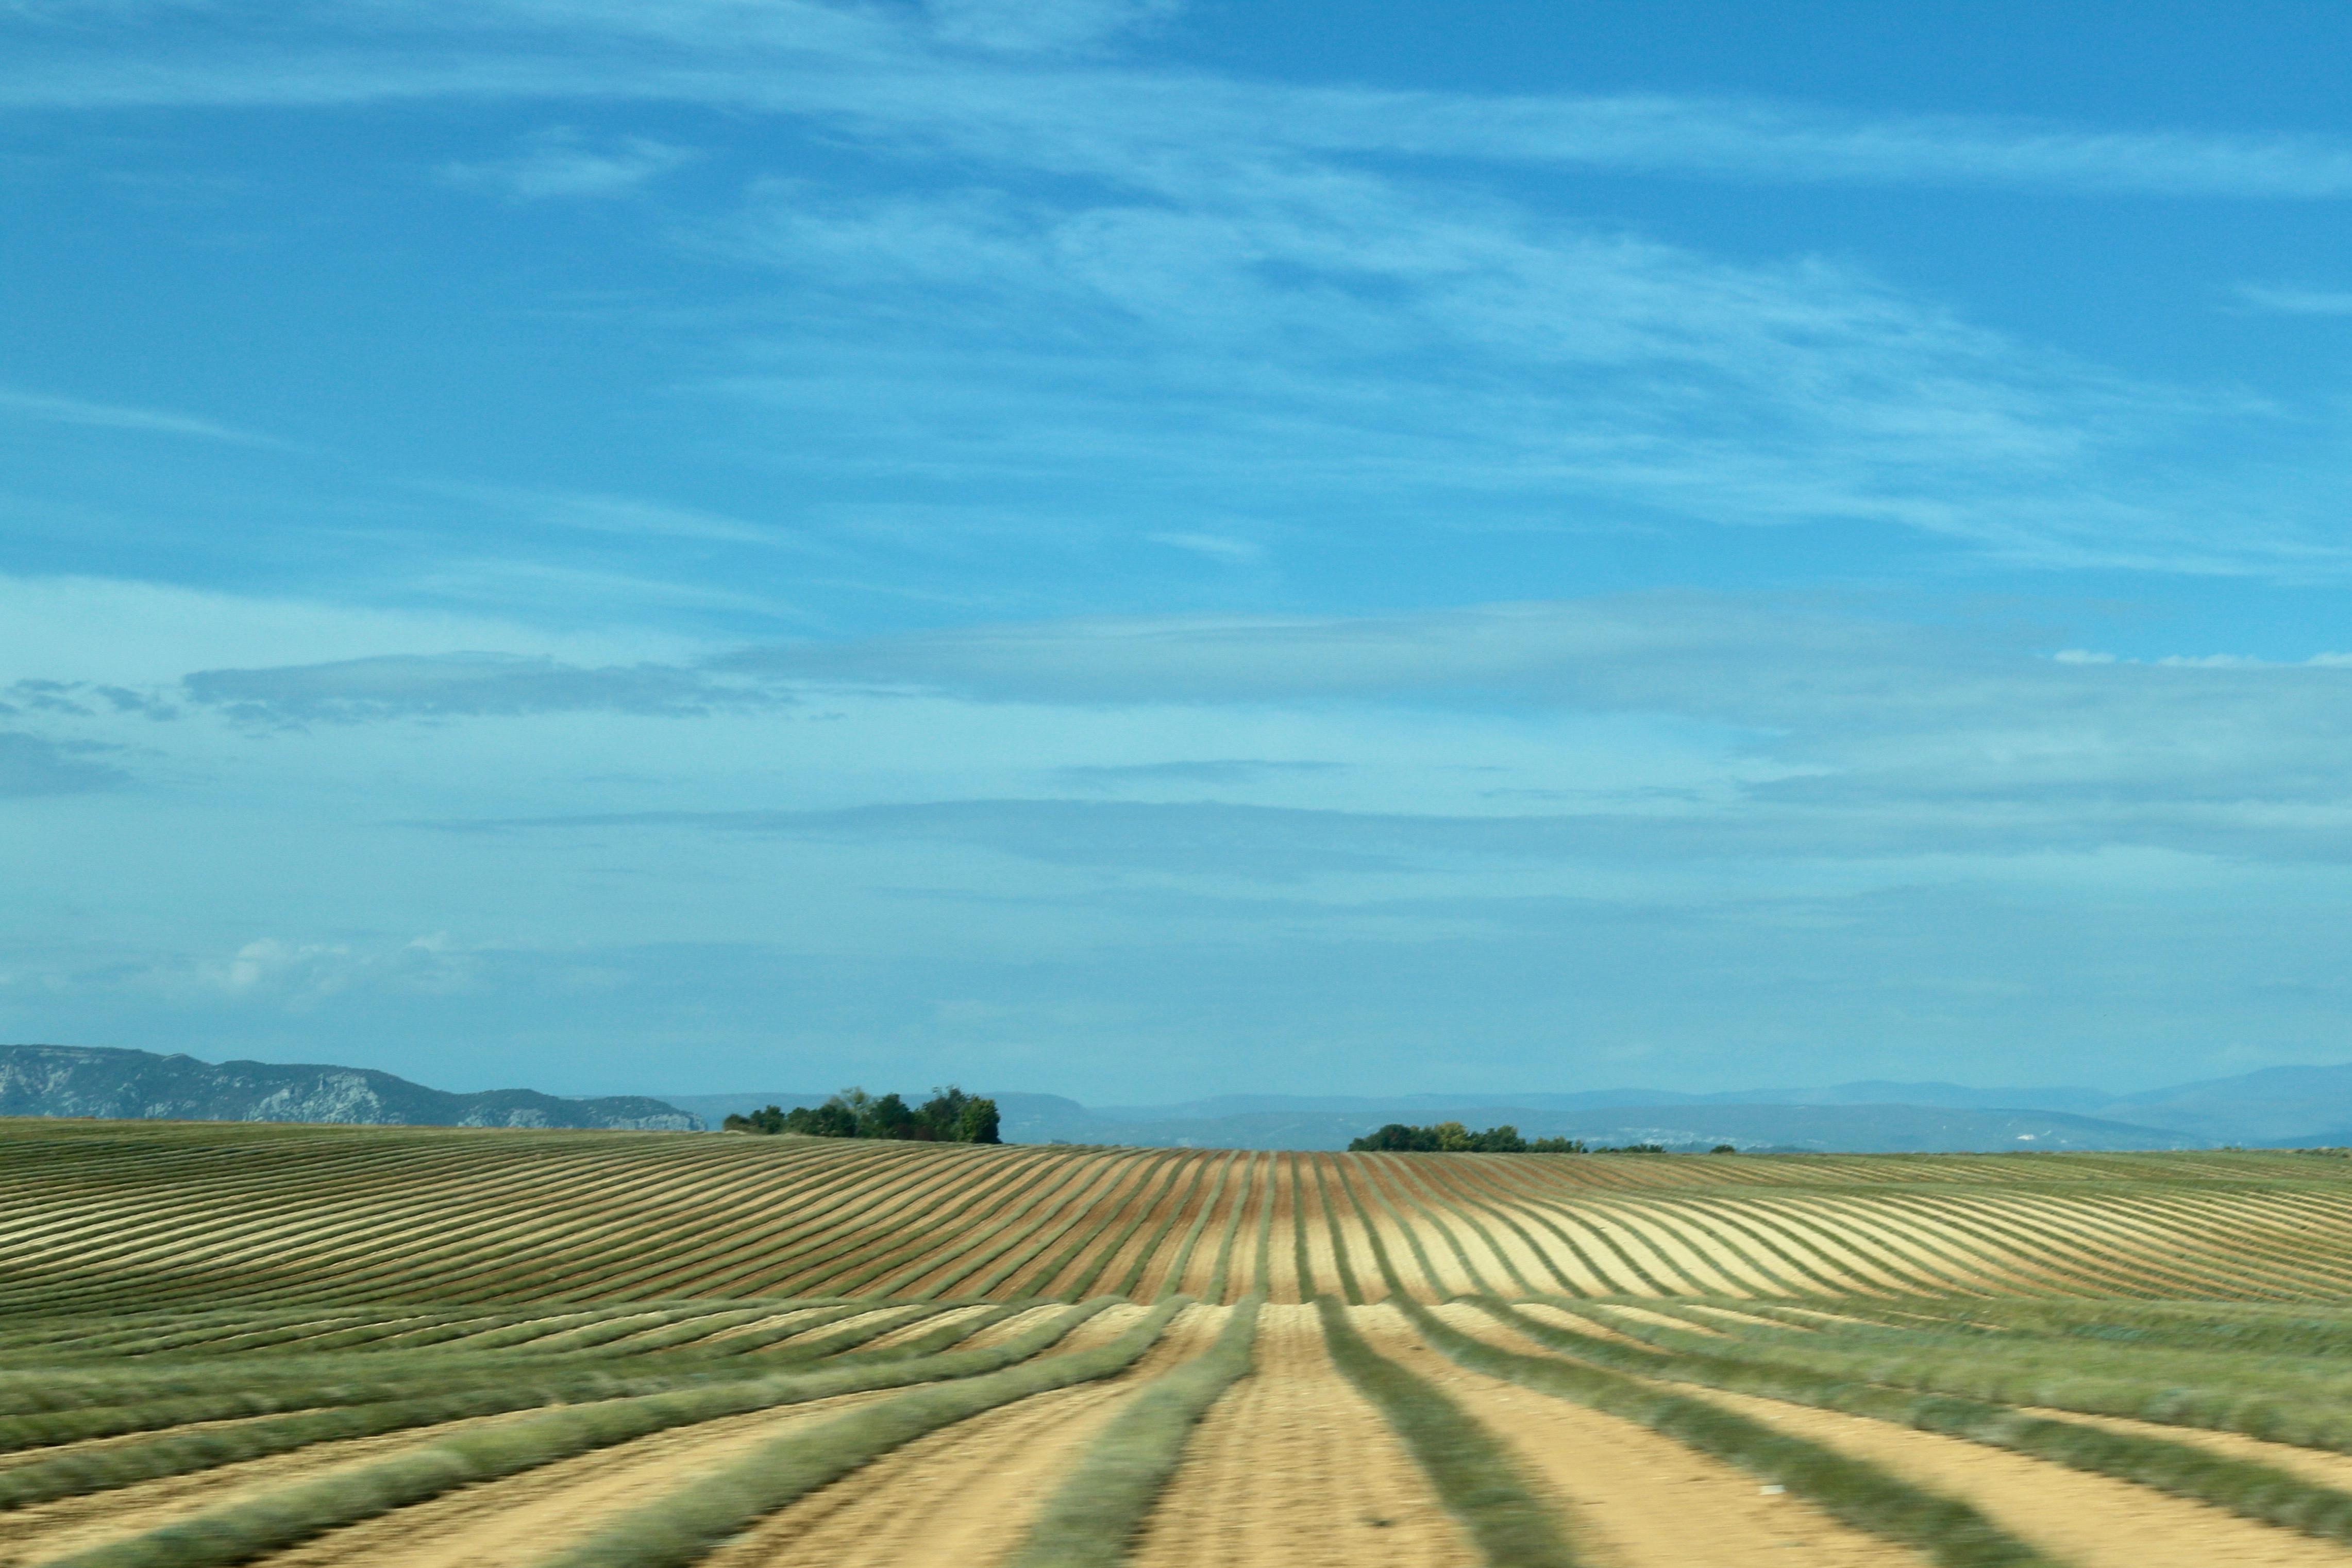 Road trip through Provence